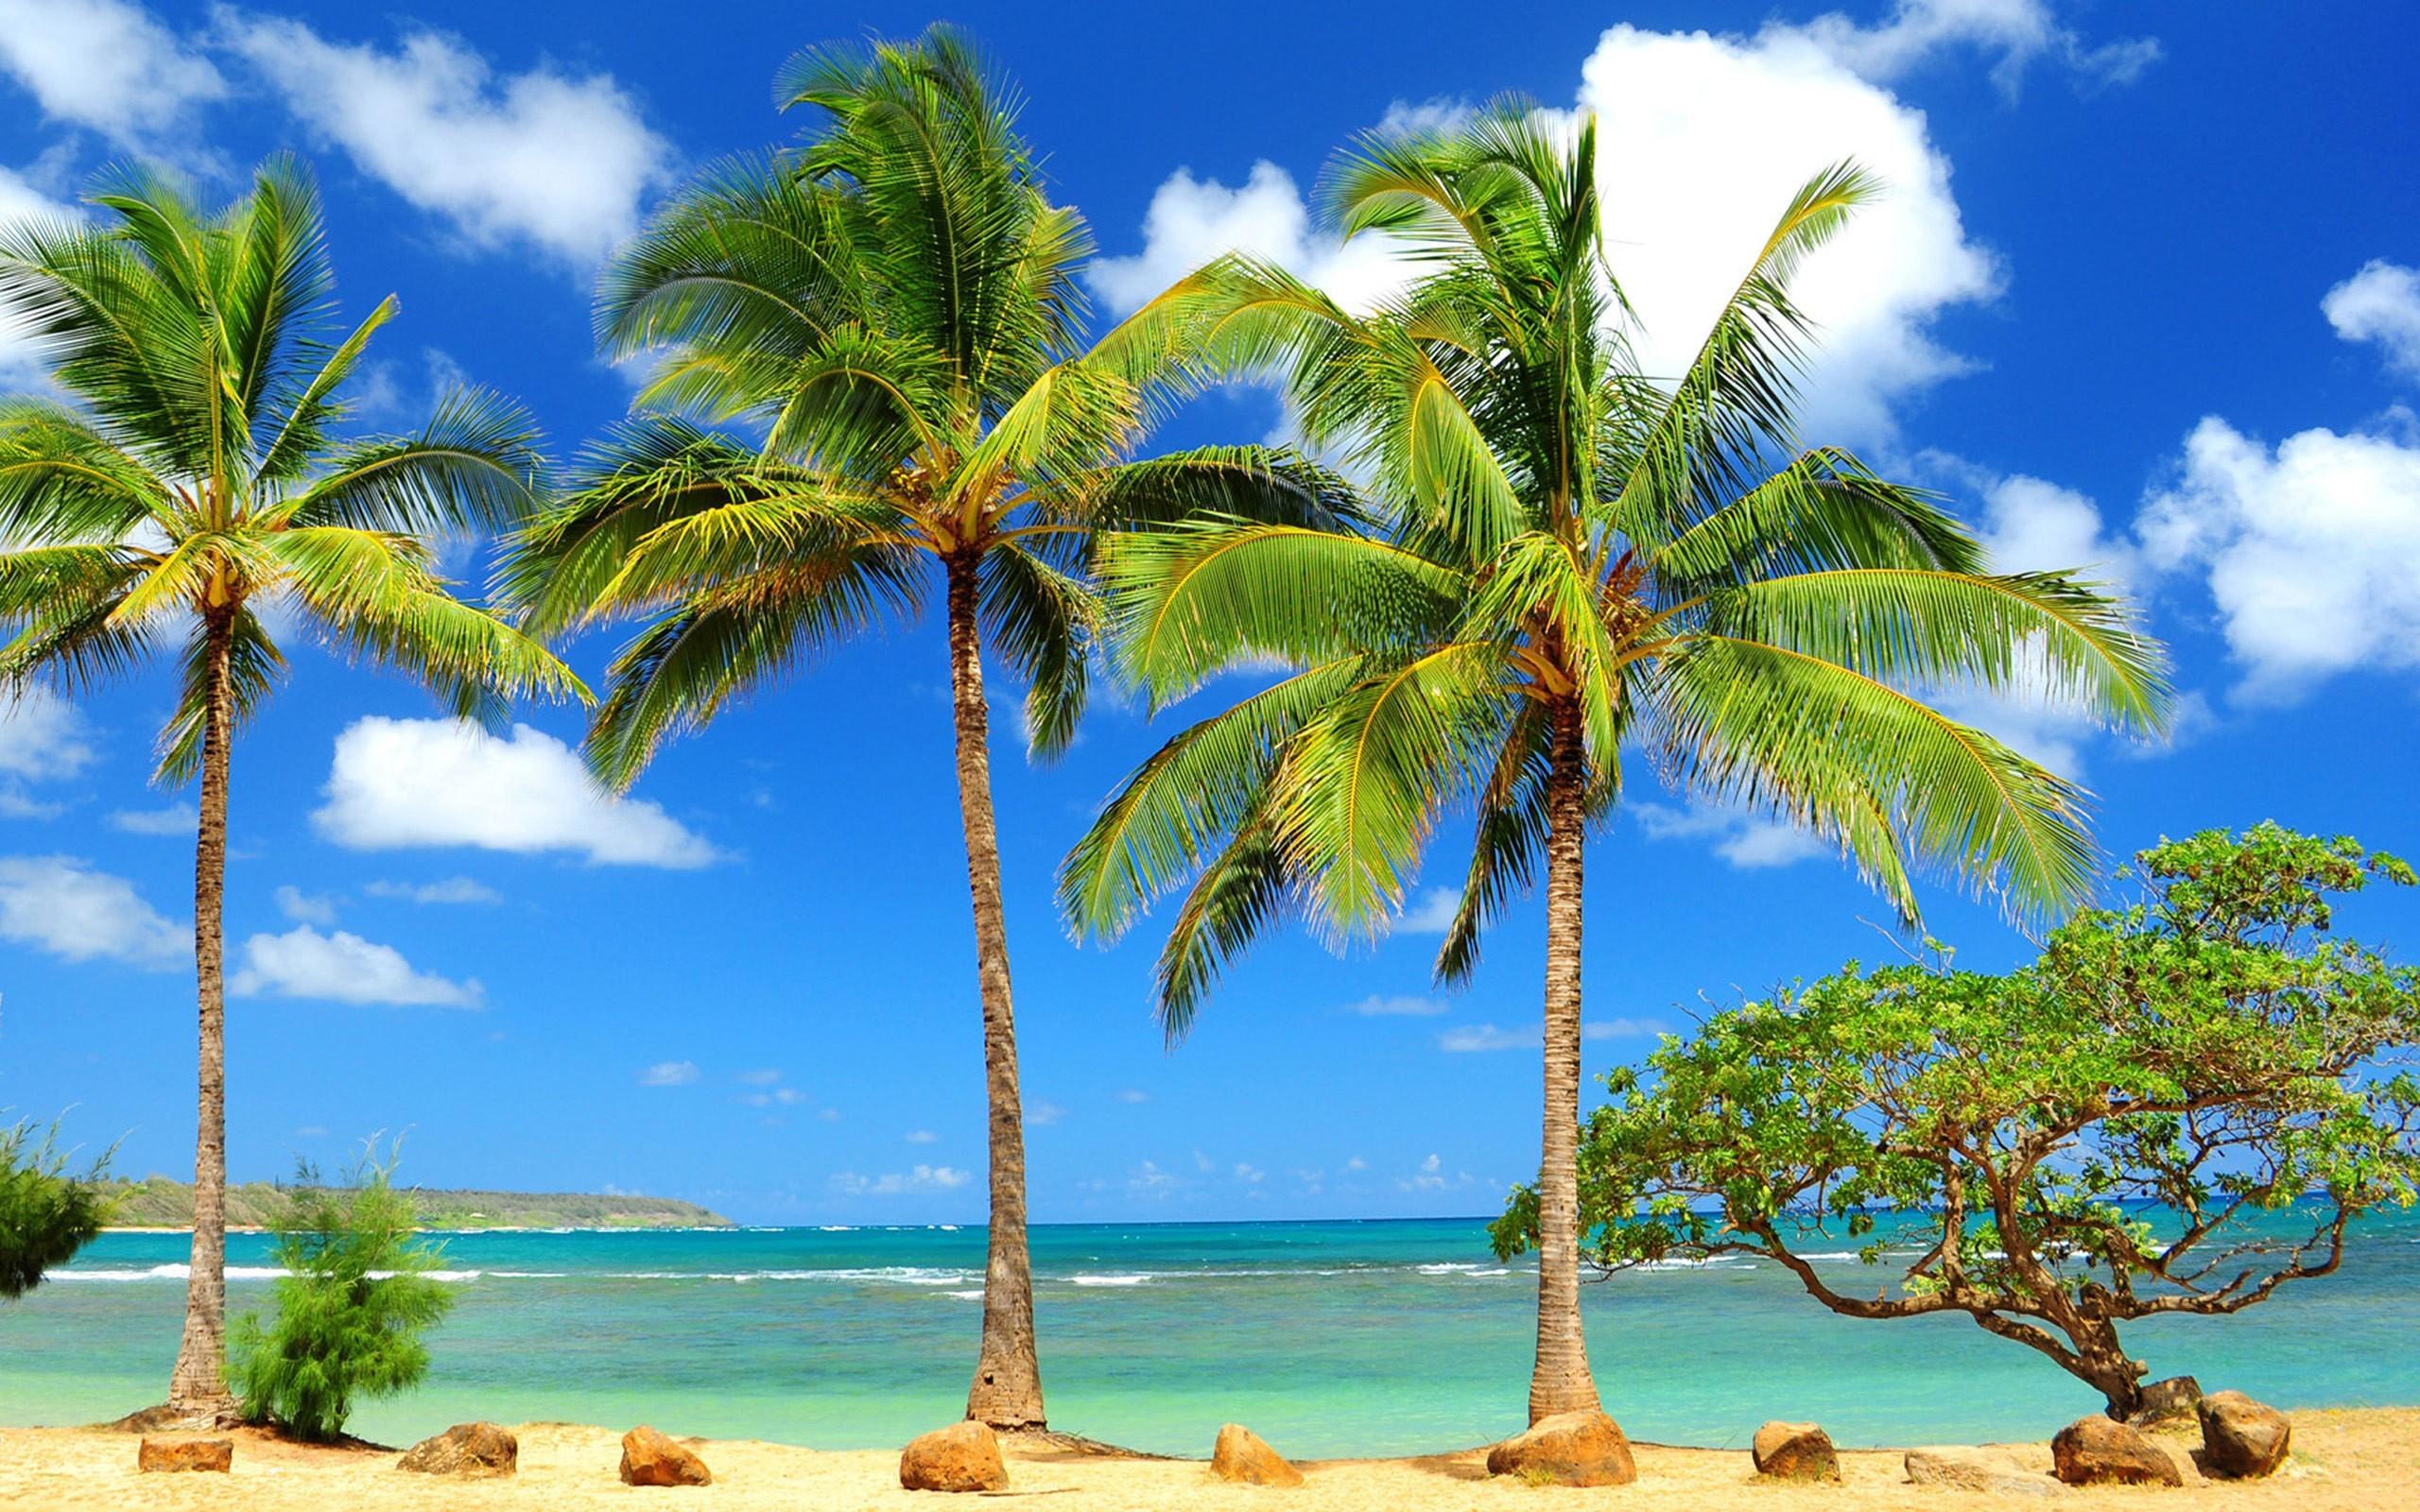 Hawaii Beach Palm Trees